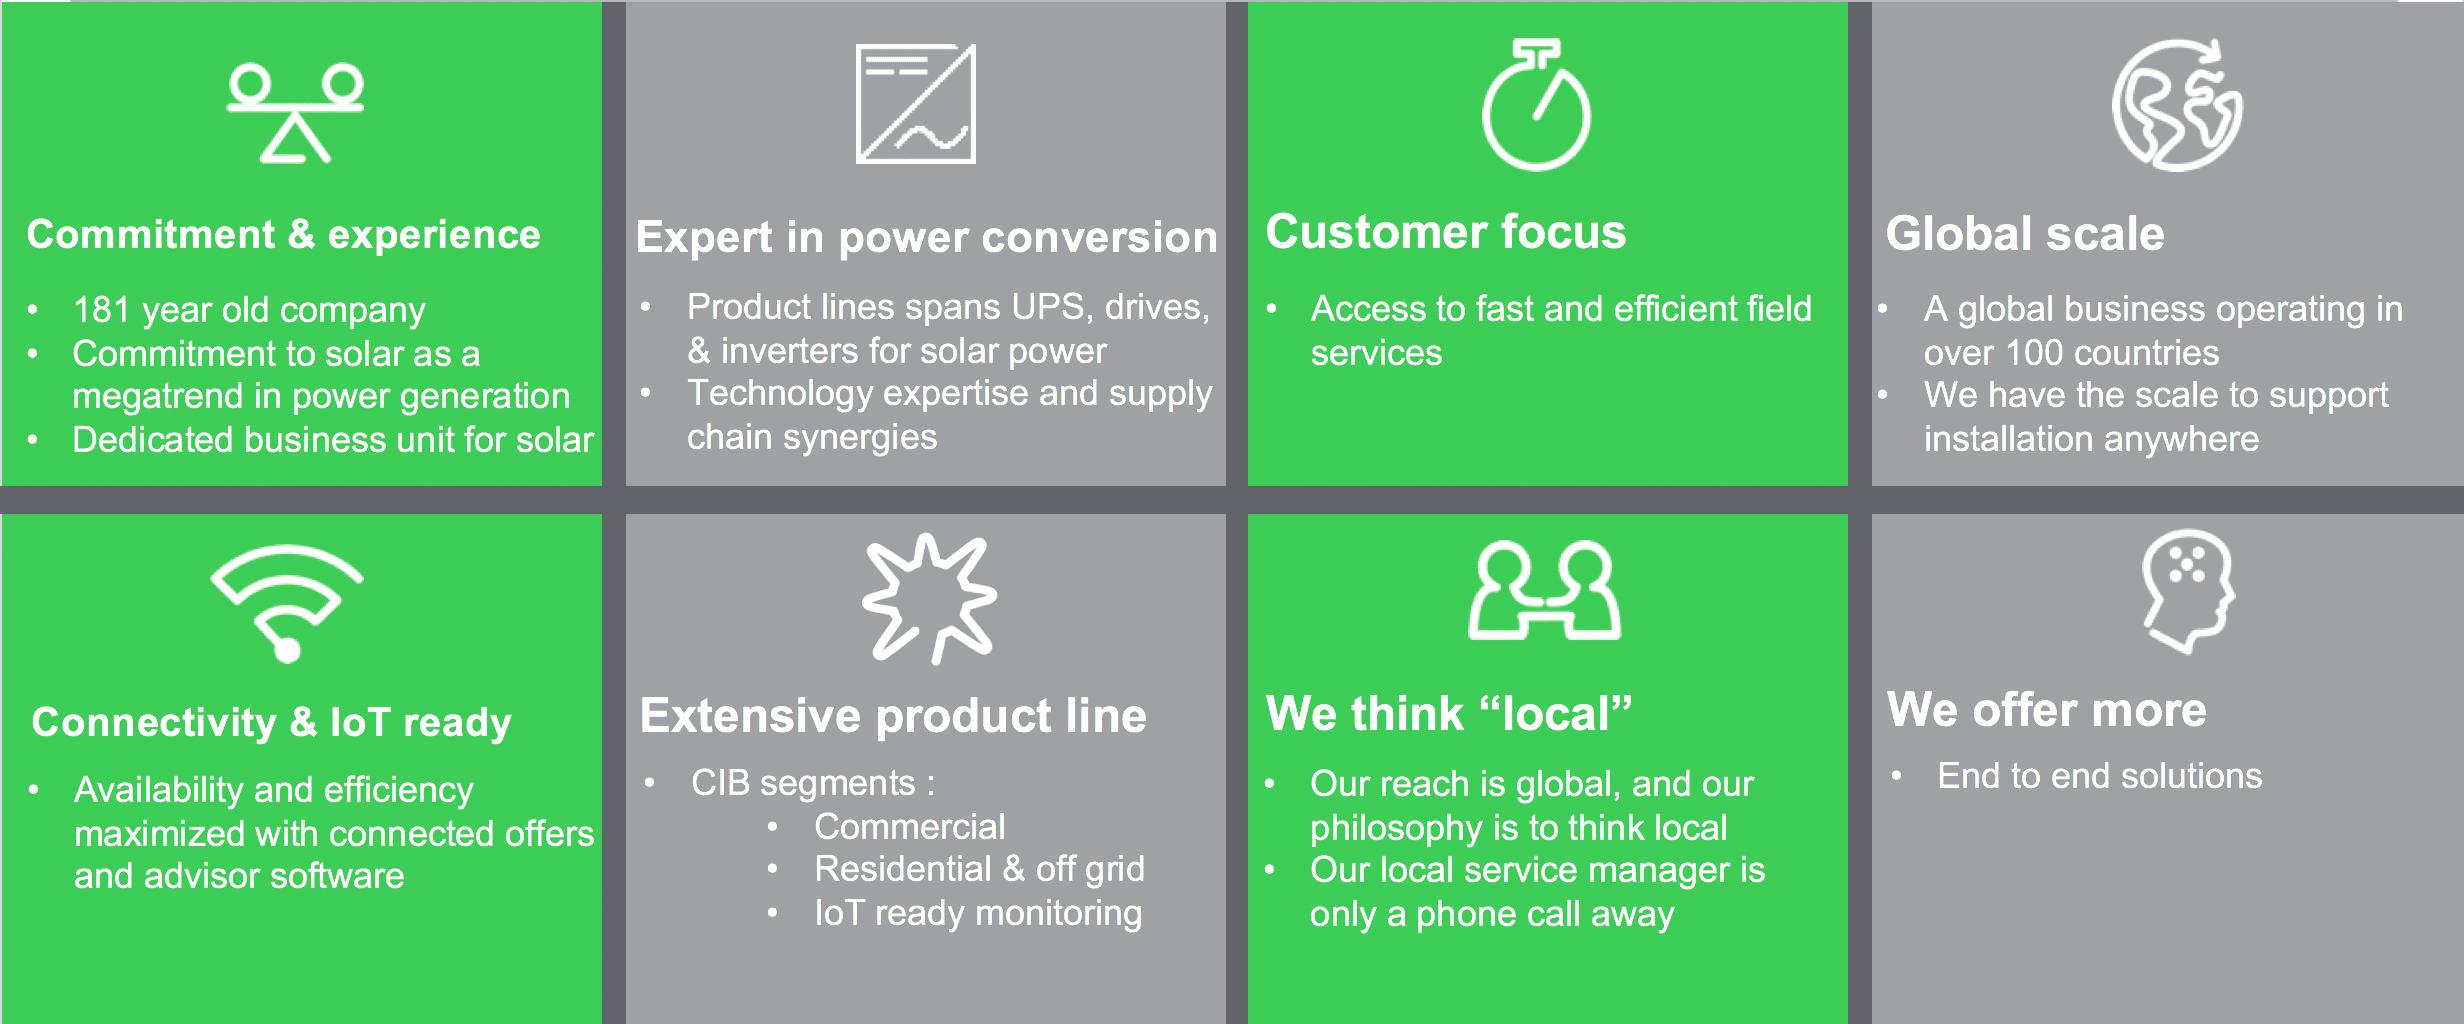 About Scheneider Electric Solar Business.